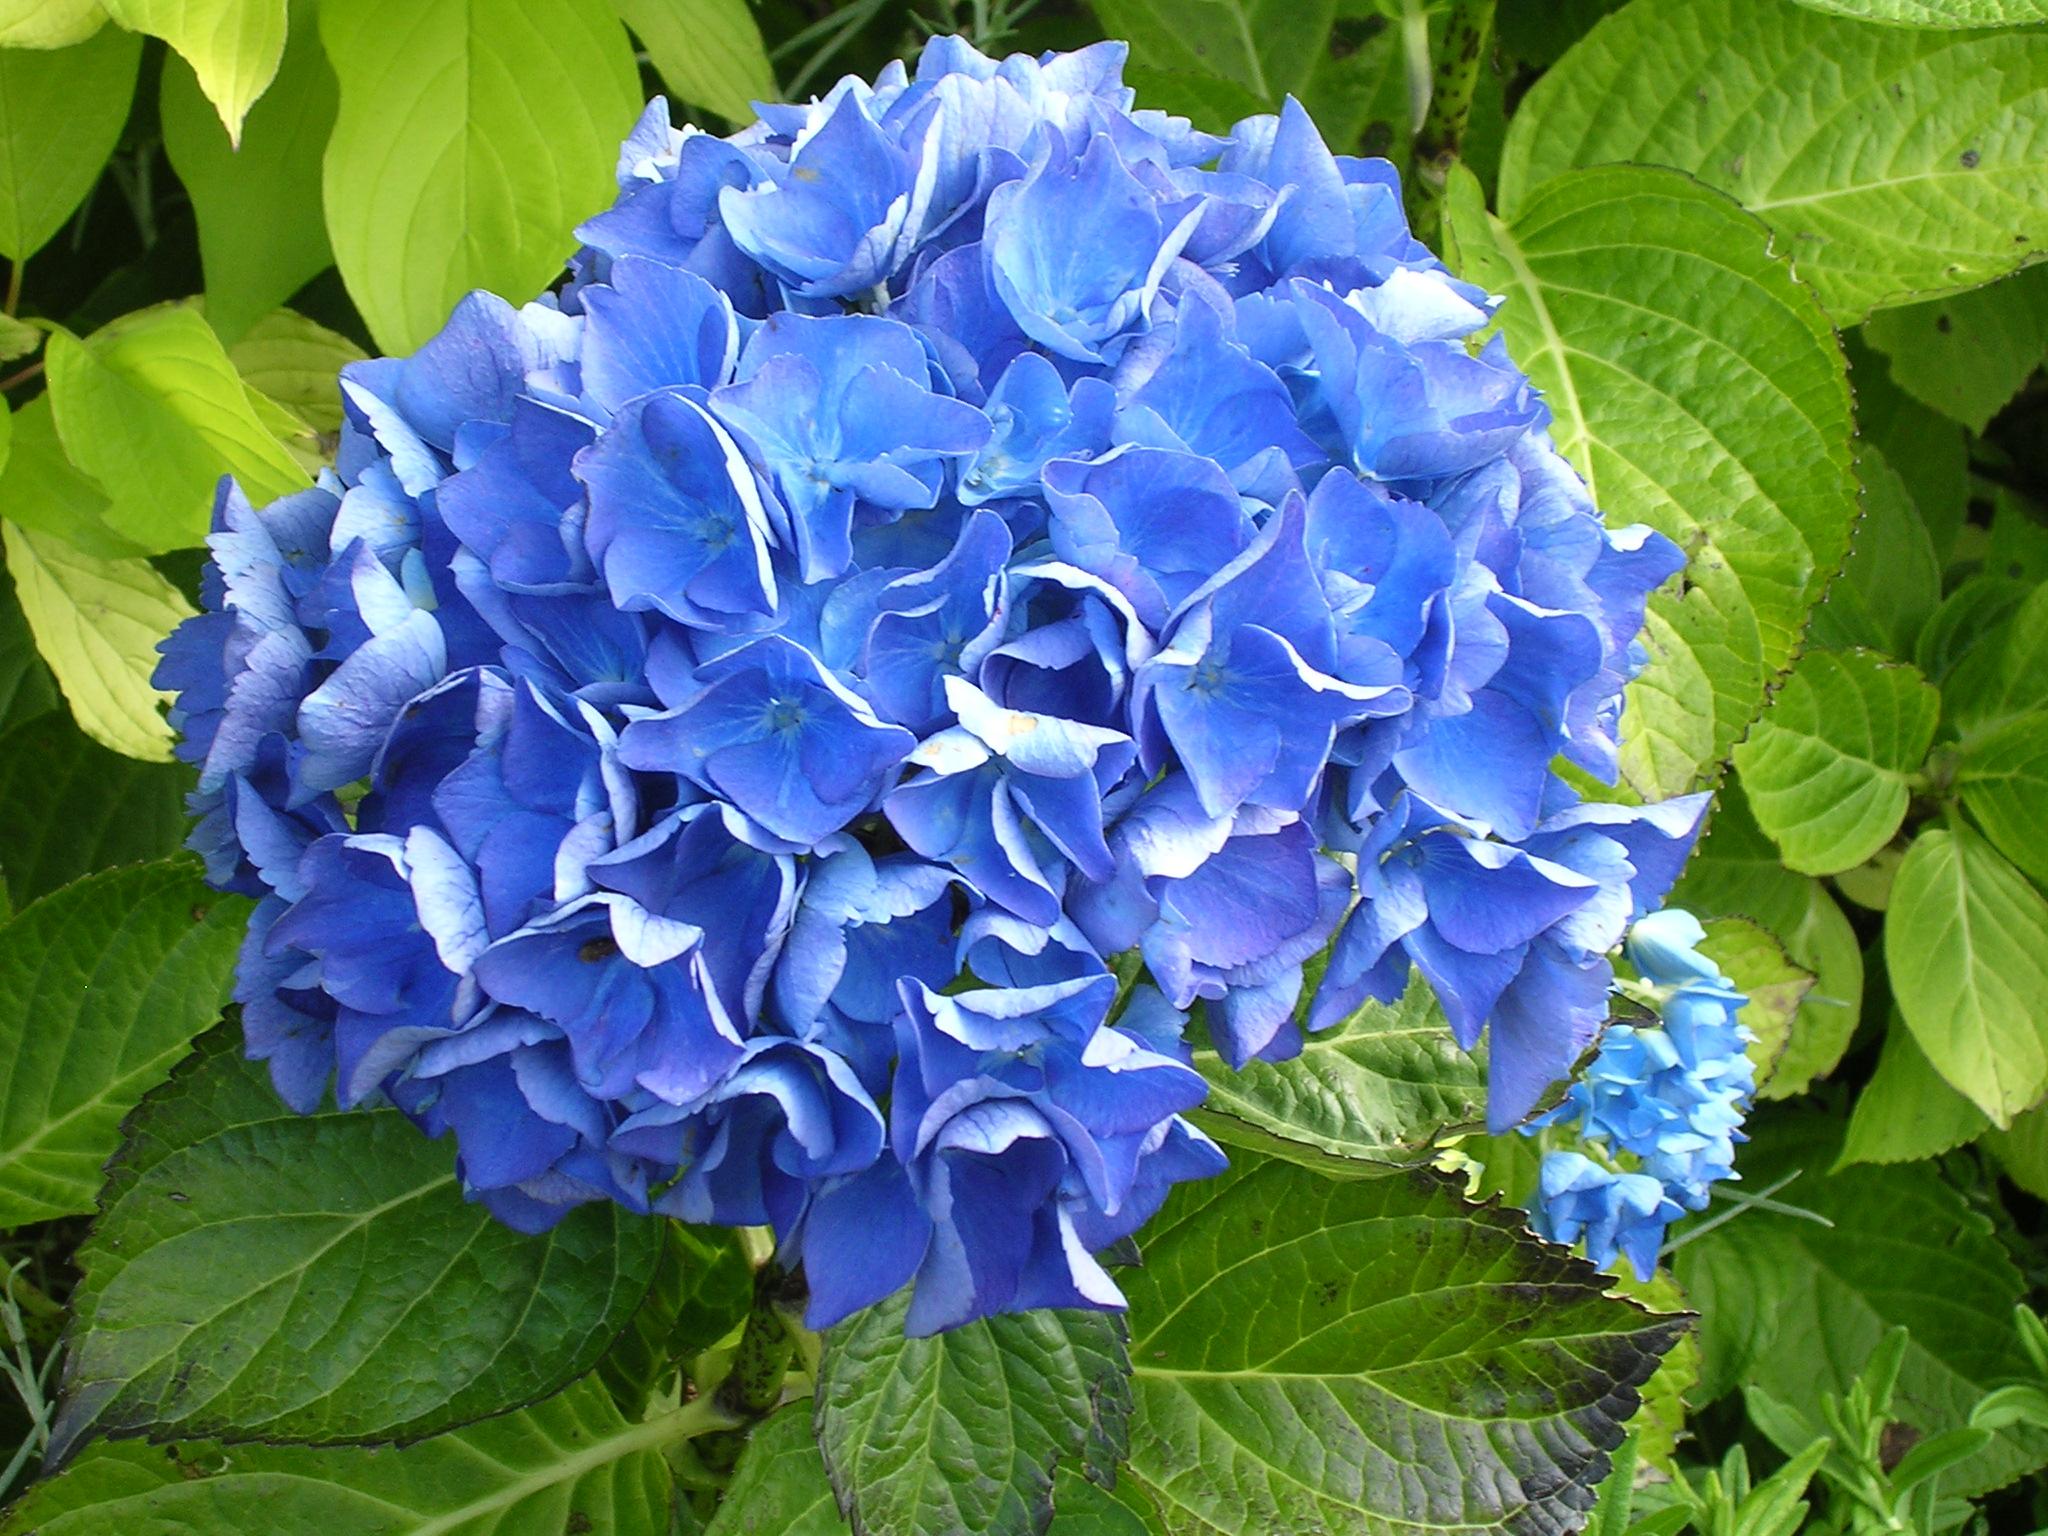 Blue Flower 14092 2048x1536 Px